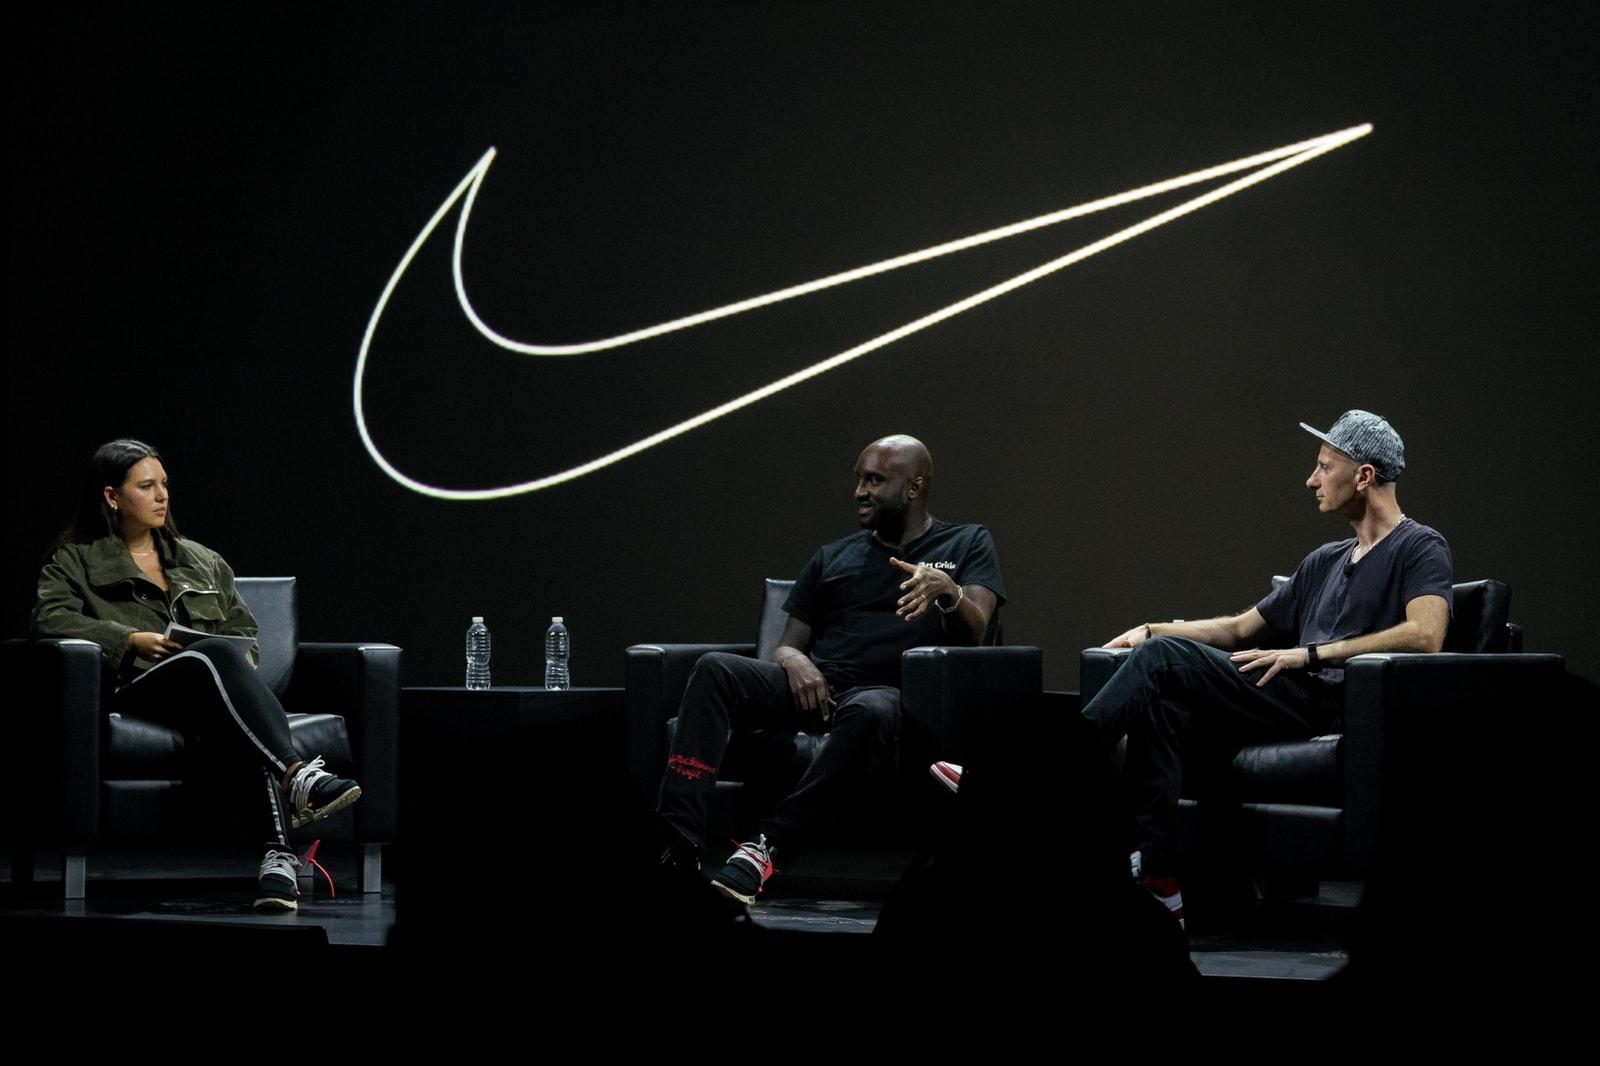 Virgil Abloh x Nike Off Campus London Activities Neville Brody Benji B